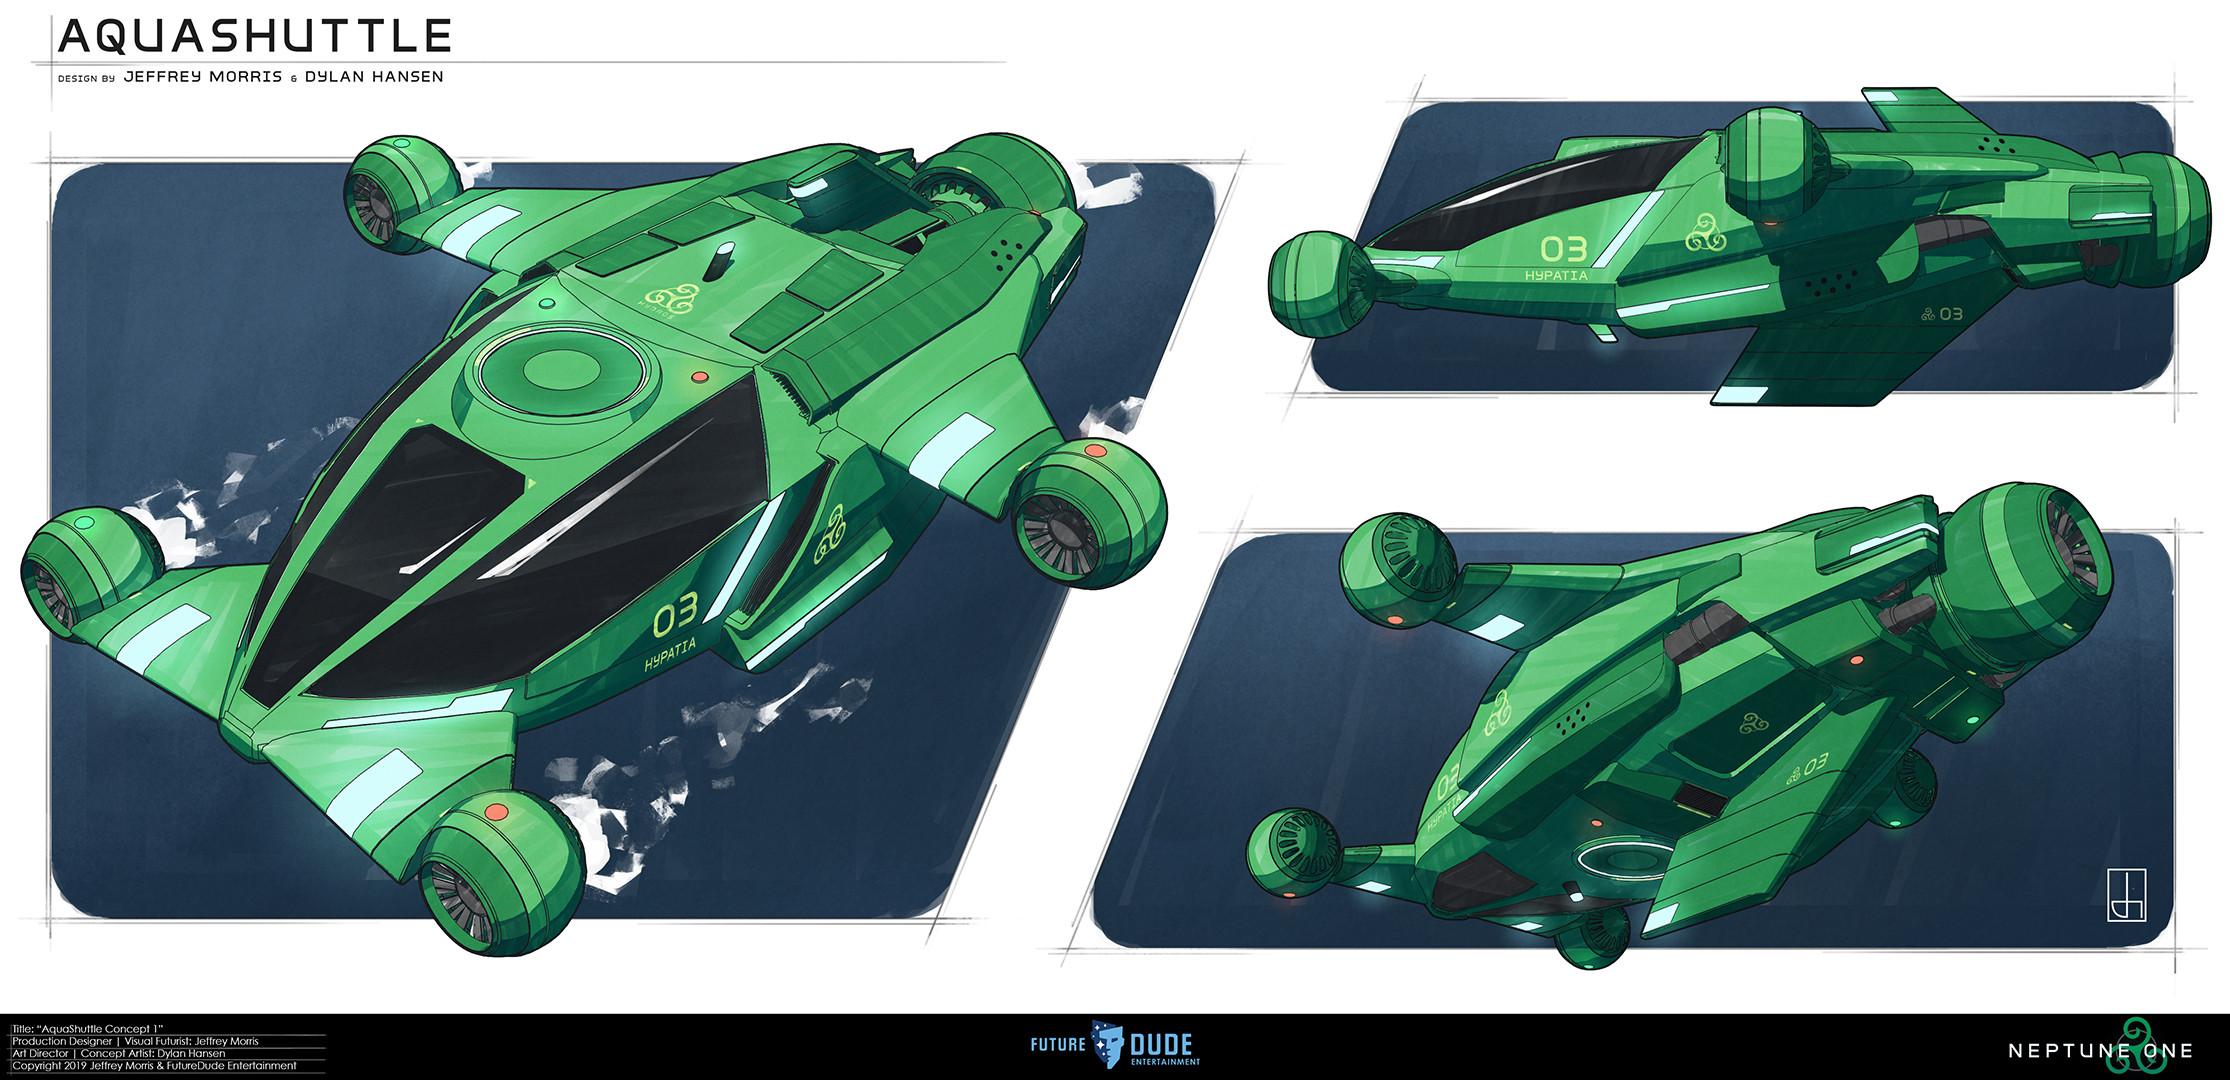 Original concept design by Jeffery Morris & Dylan Hansen